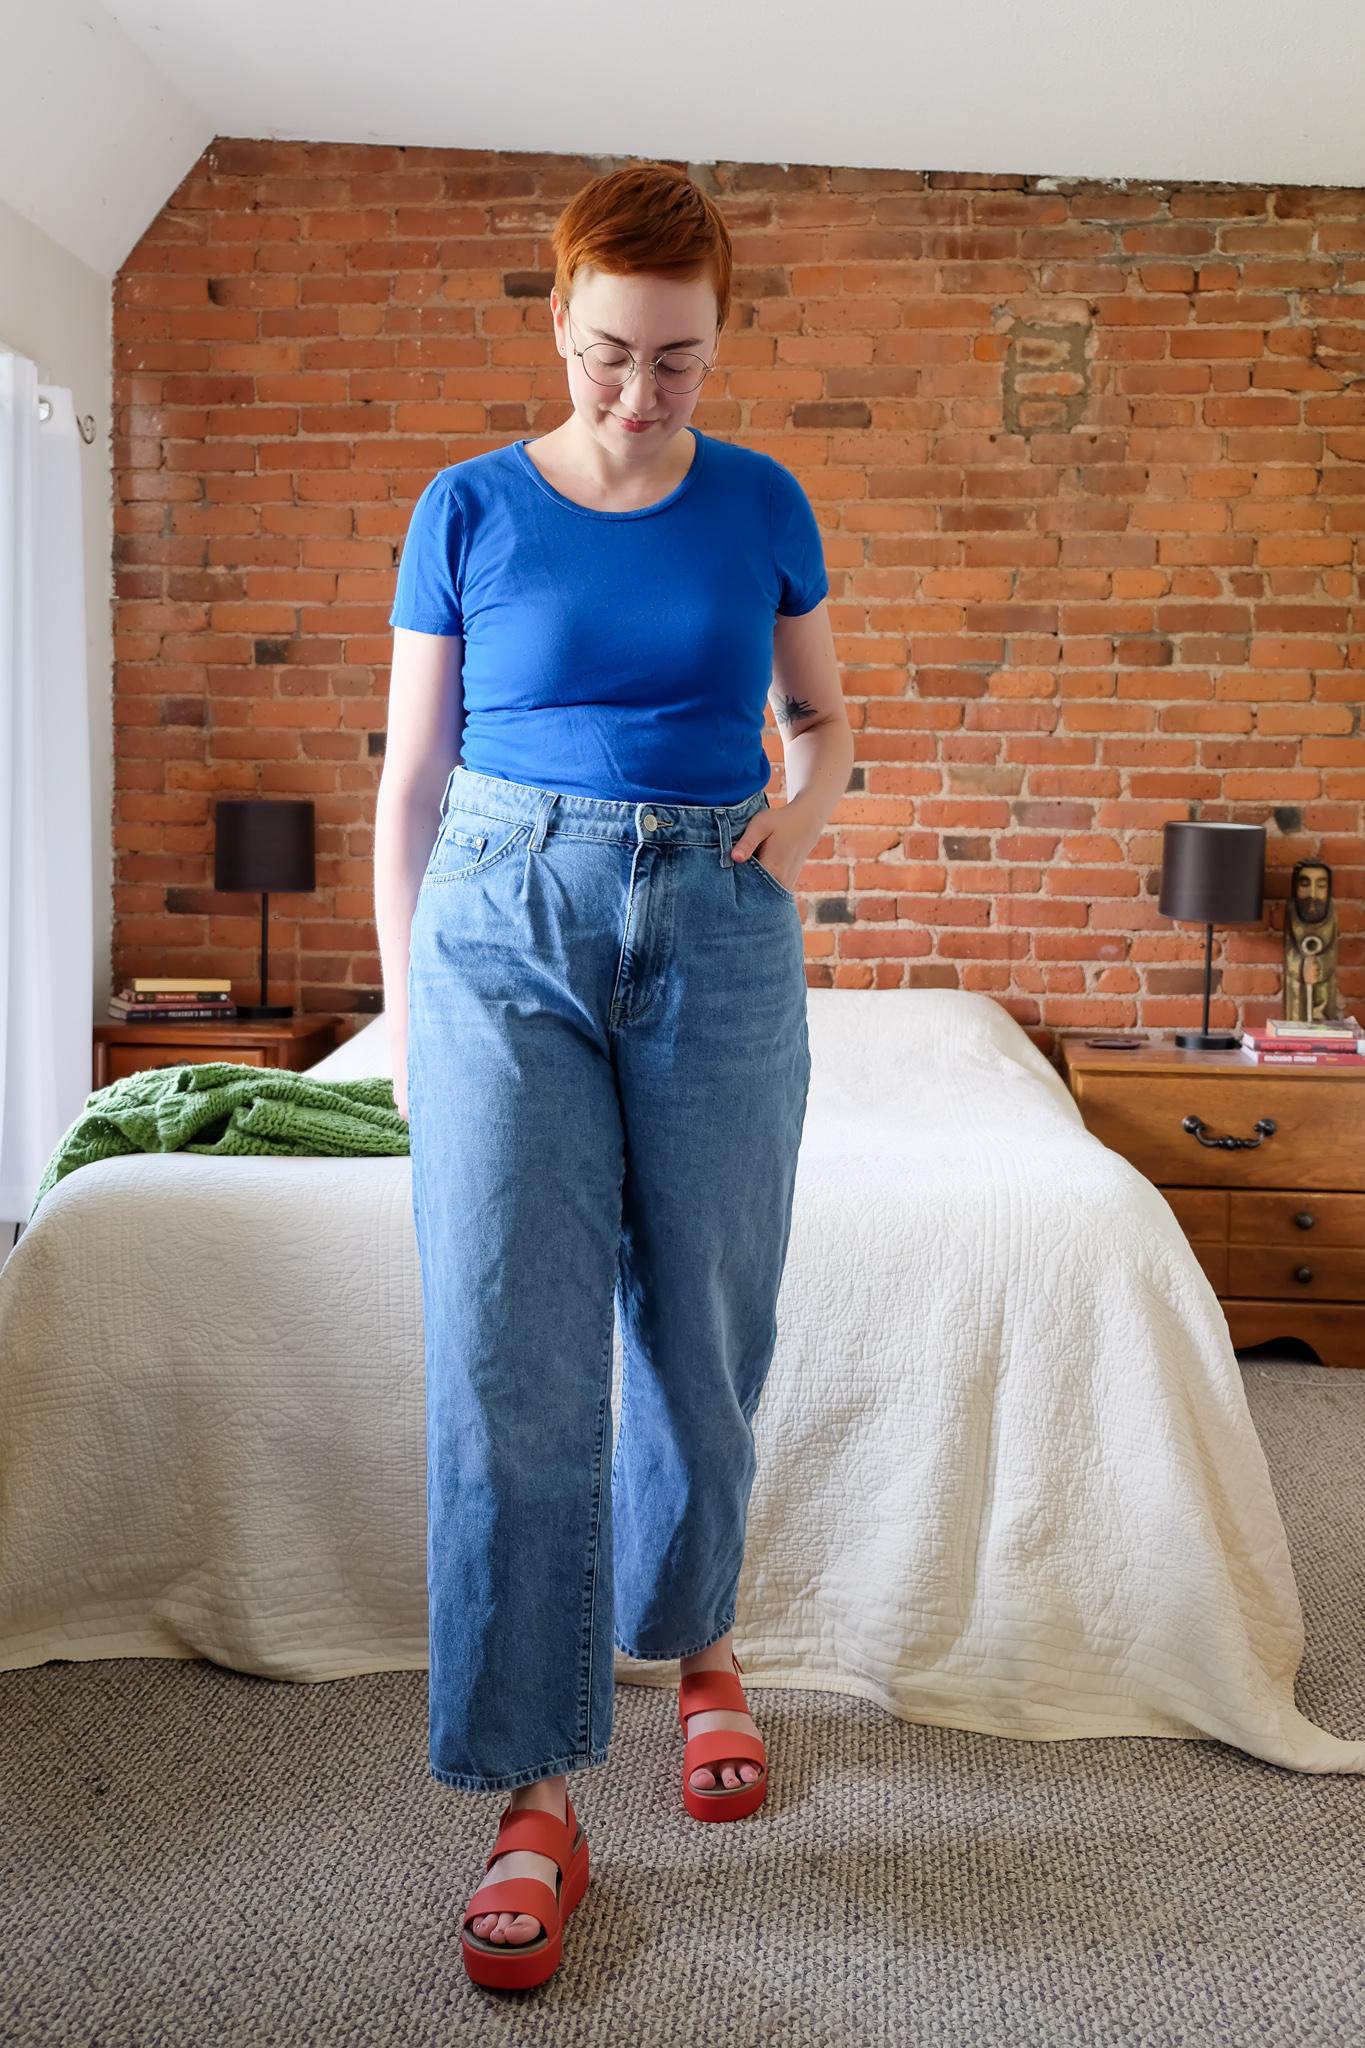 Thoughtful Summer Outfits Roundup - Crocs platforms